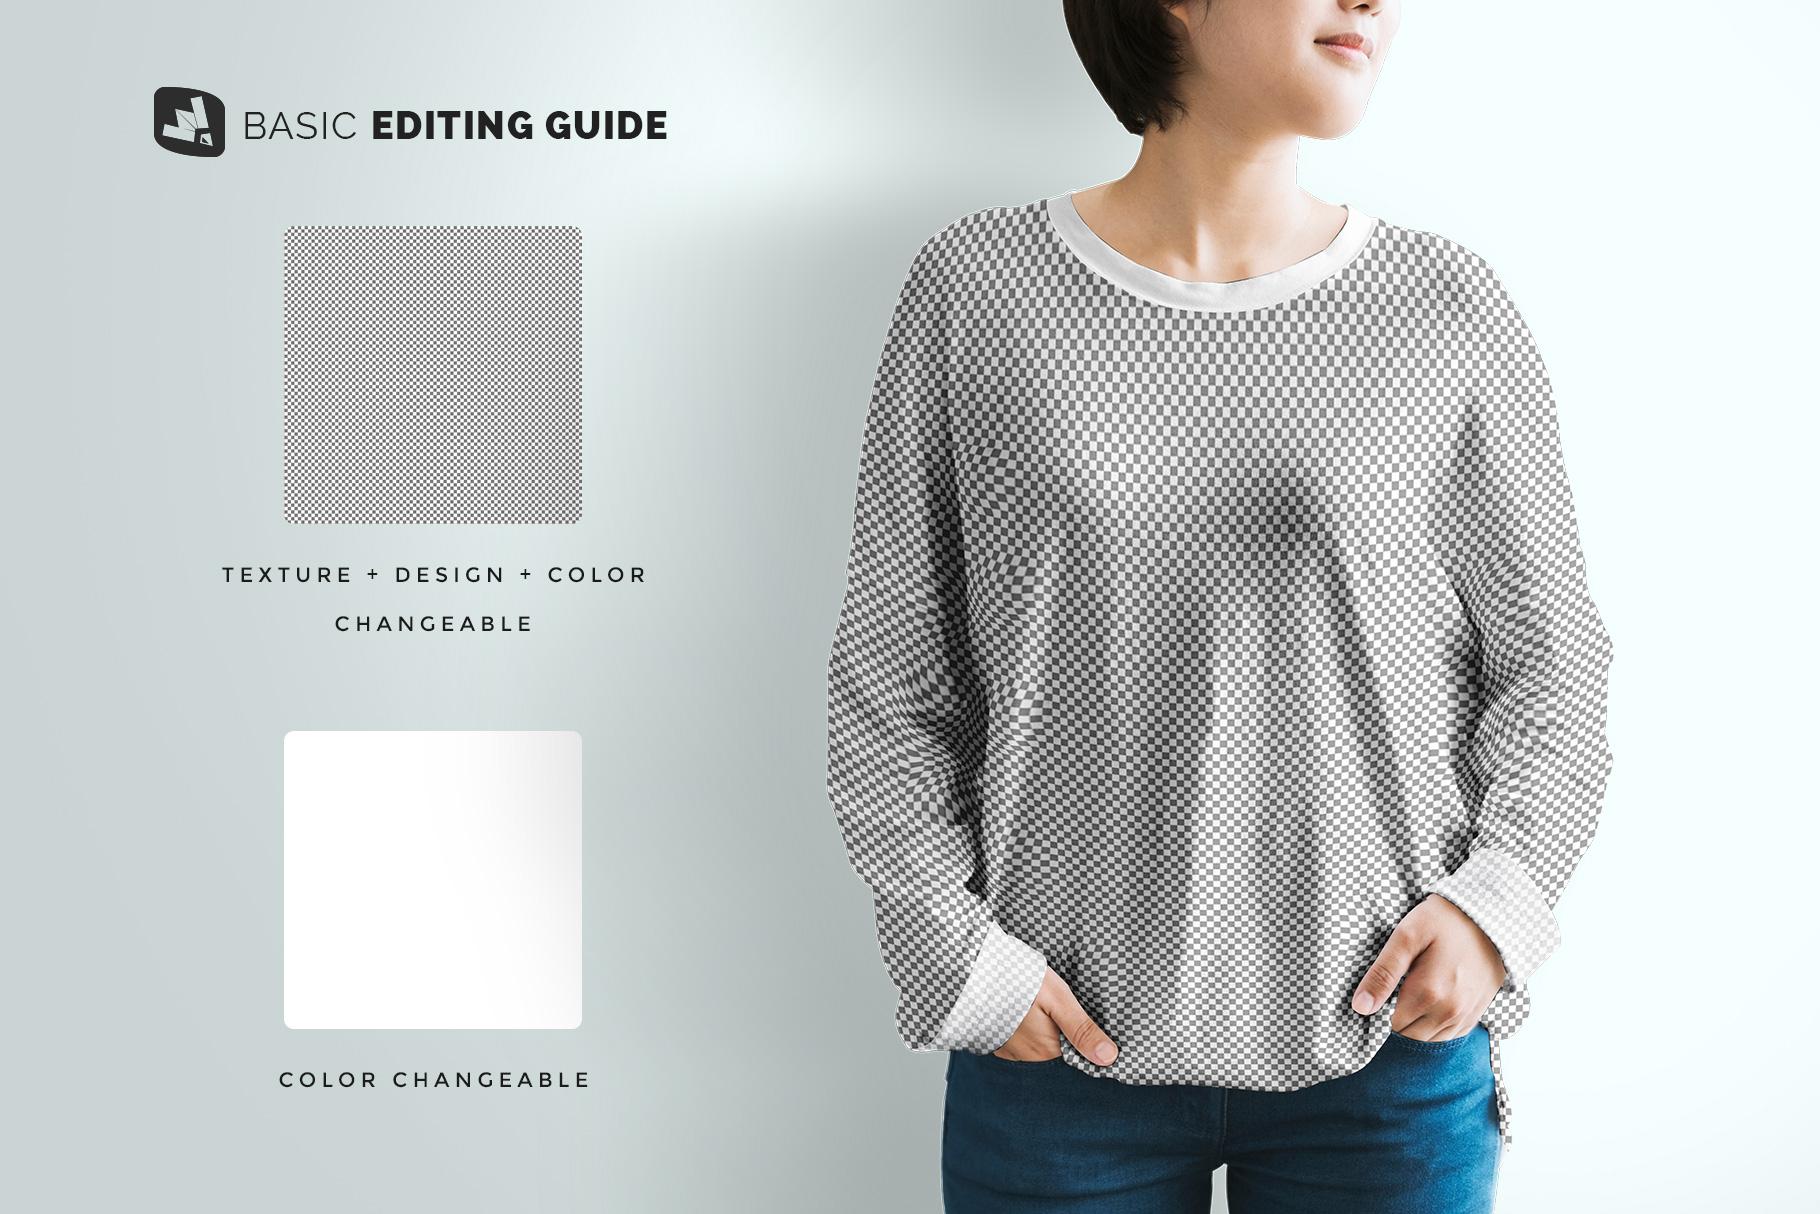 editability of the women's full sleeve tshirt mockup